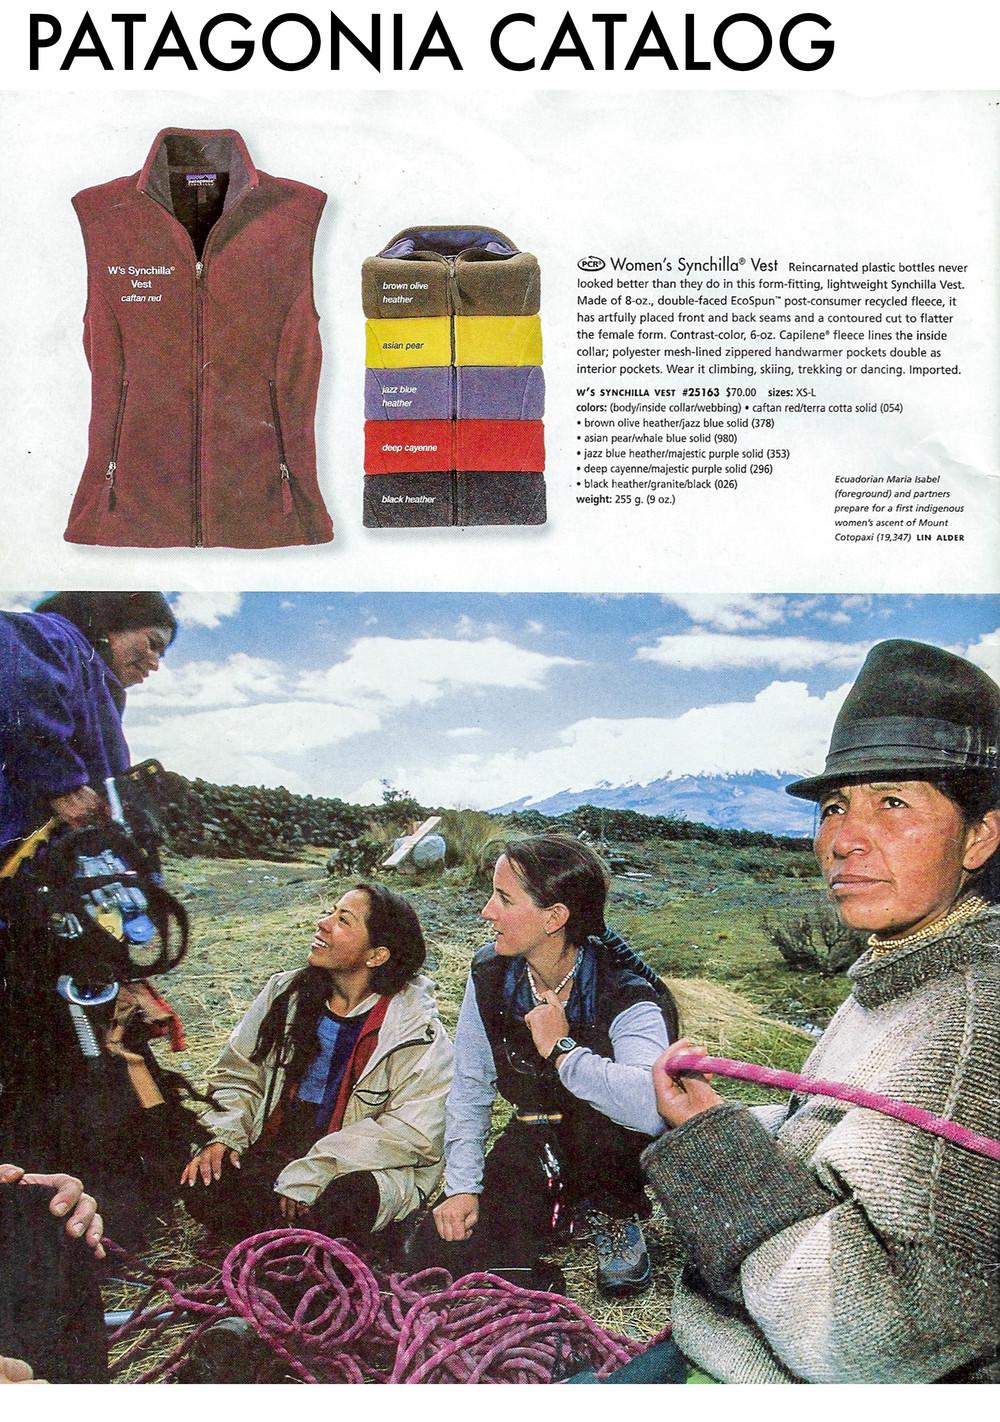 PatagoniaCatalog.jpg